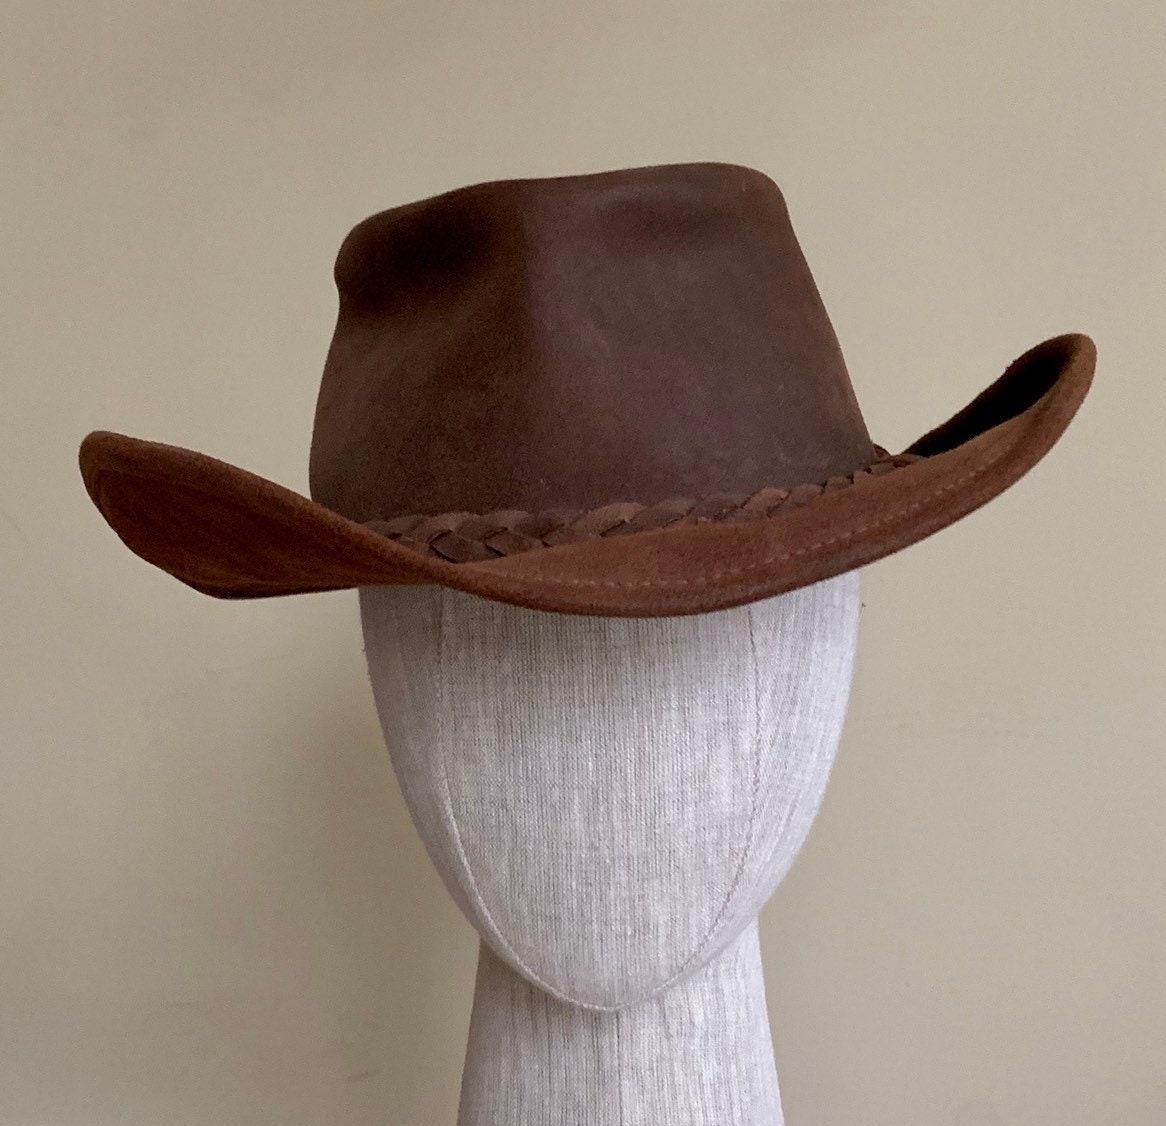 b94b44608 Brown Leather Cowboy Hat Vintage Western Braided Hat Band Distressed ...